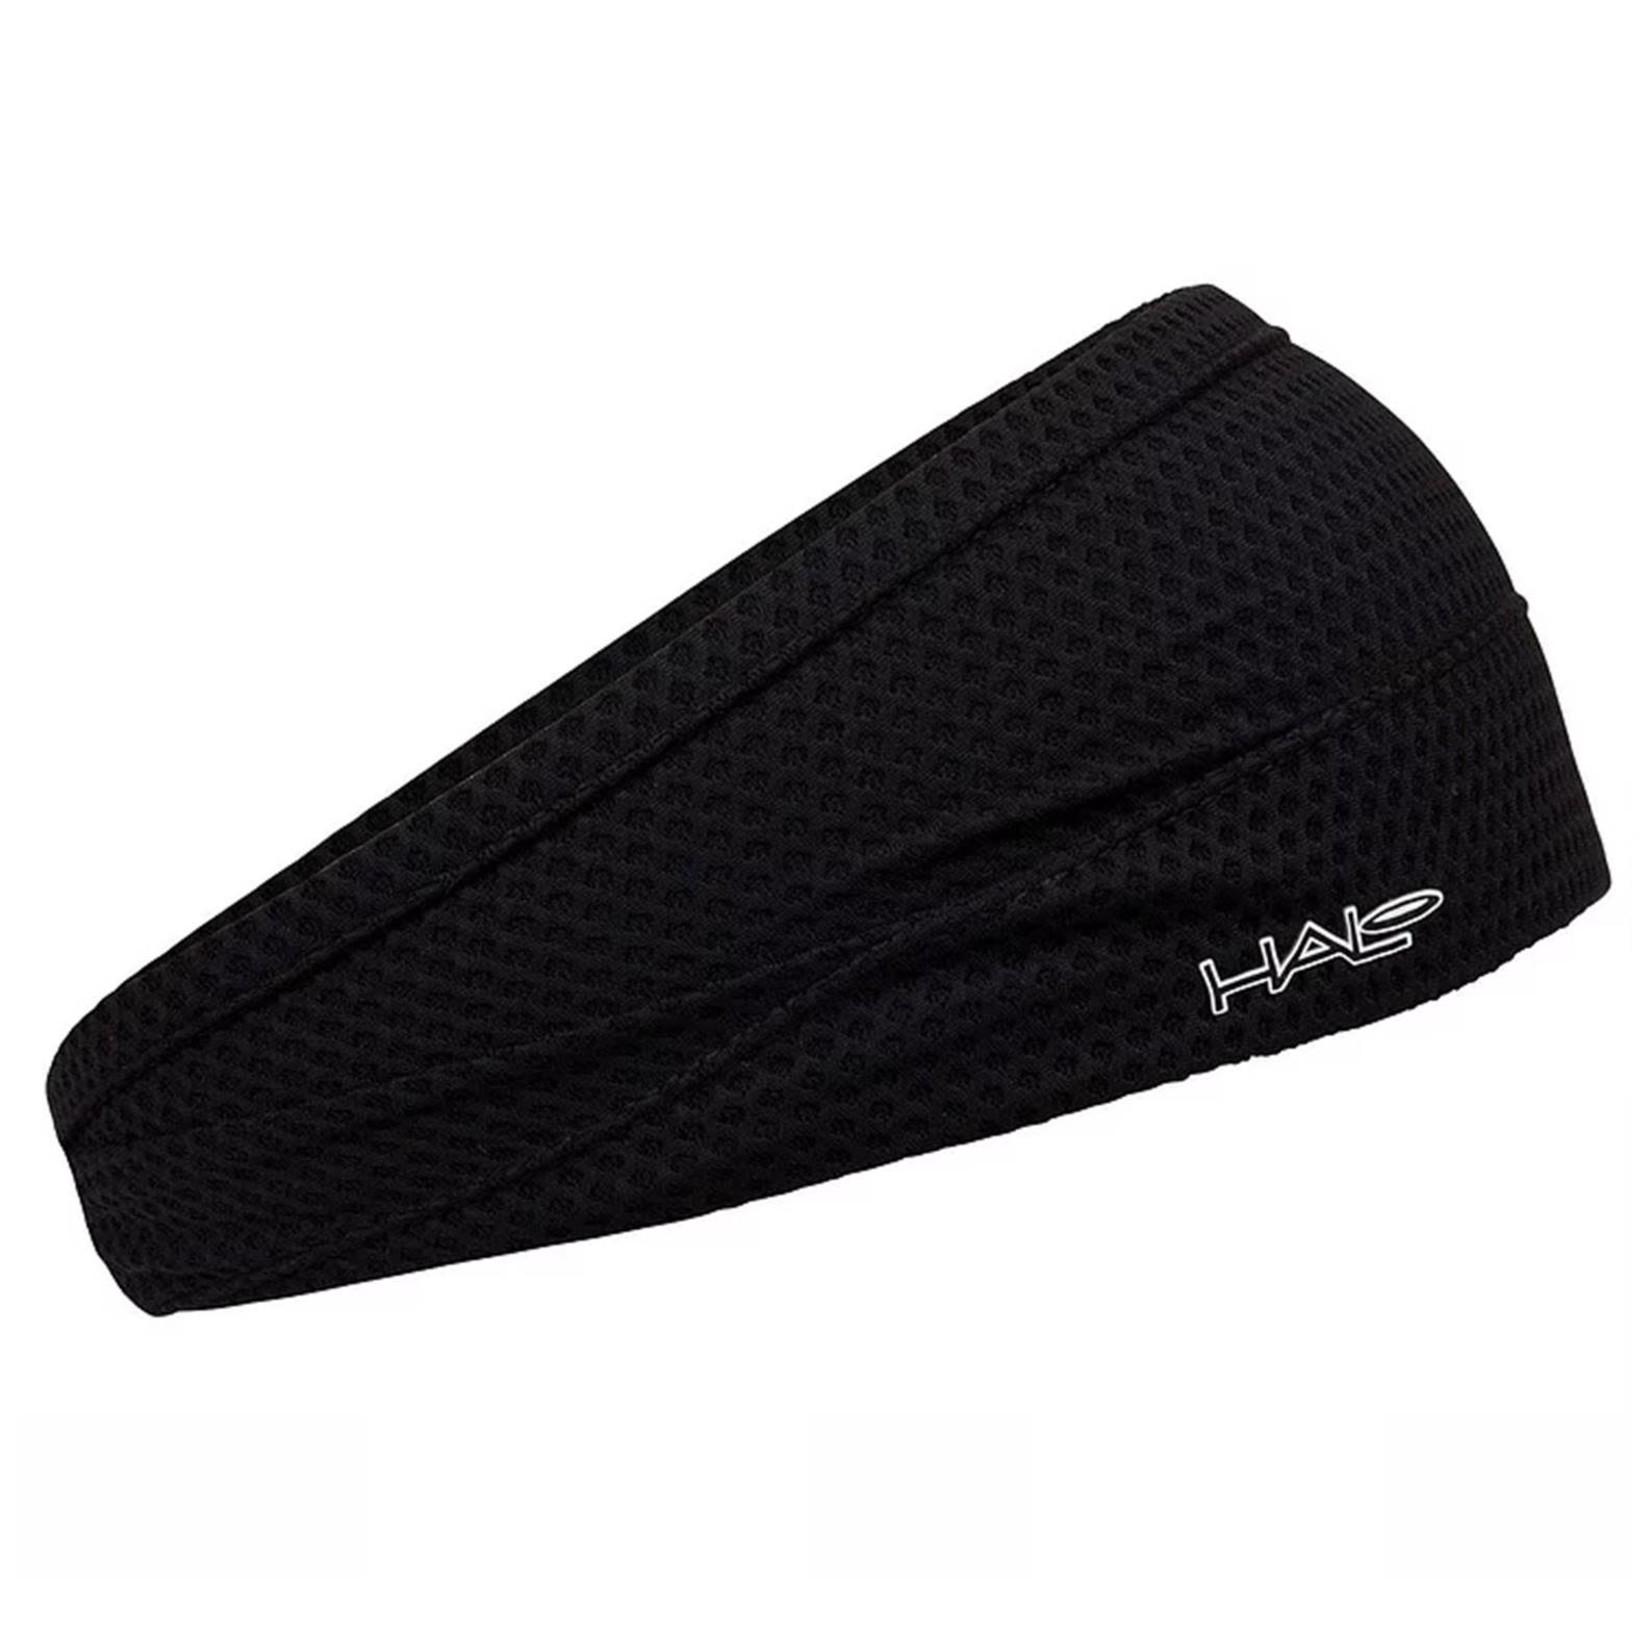 Halo Bandit Headband Black